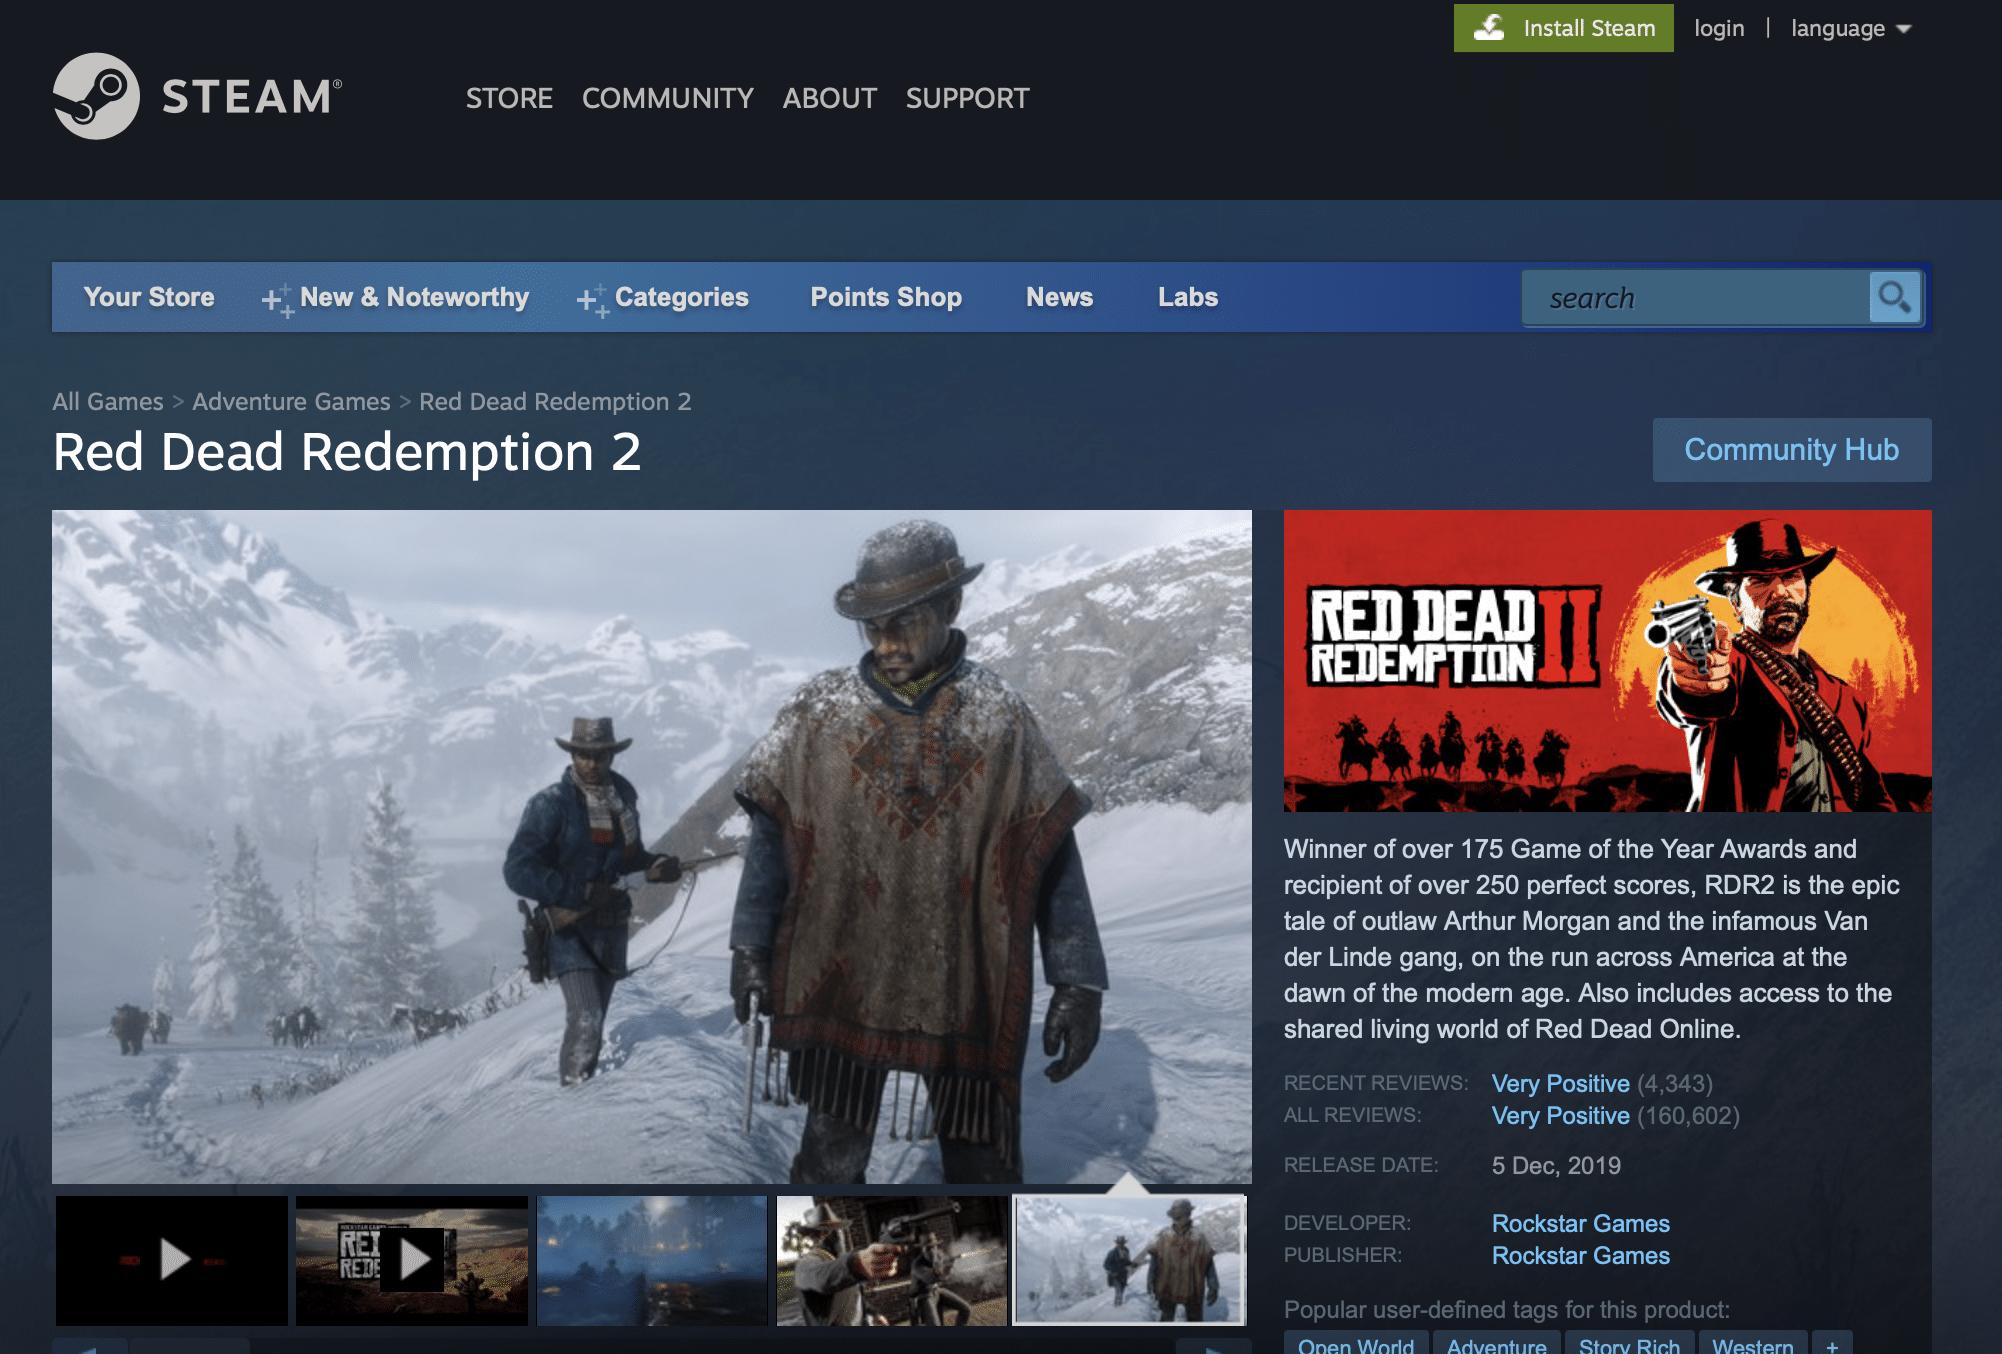 red dead redemption 2 steam page